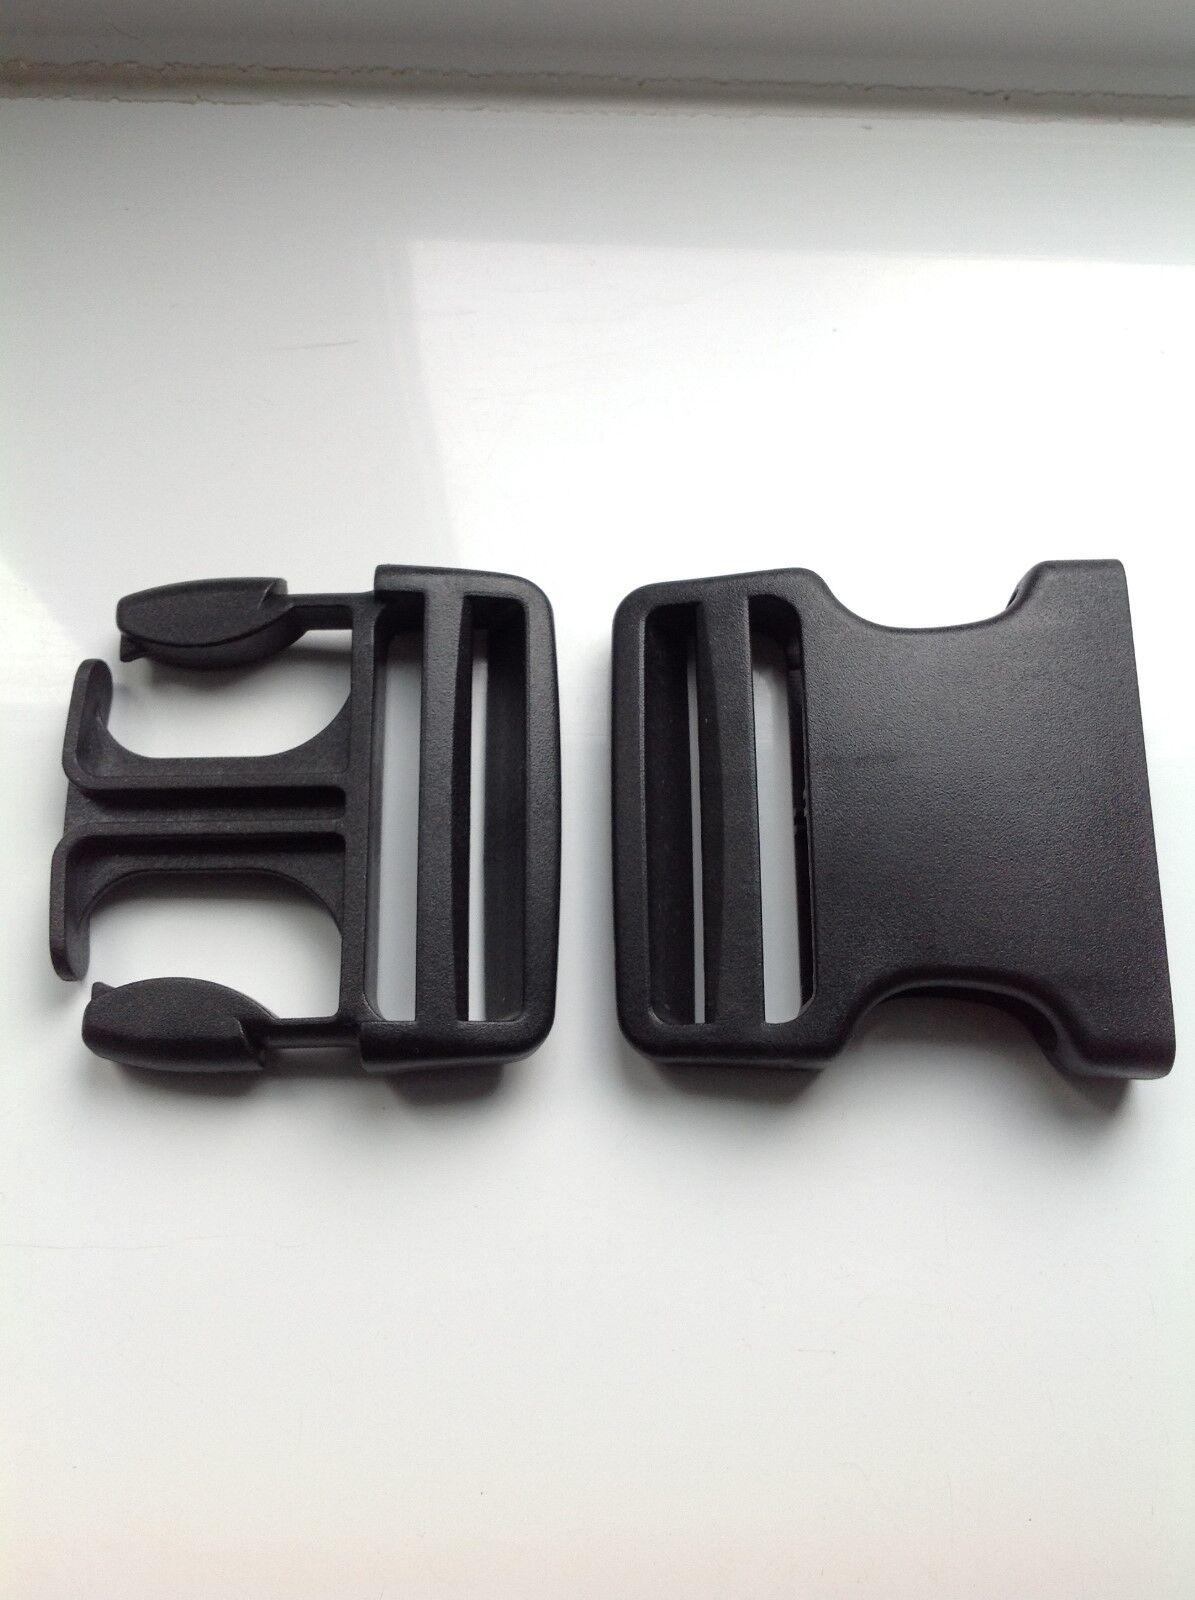 Pair of Classic Karrimor Side Release Buckle 25mm Black Nylon